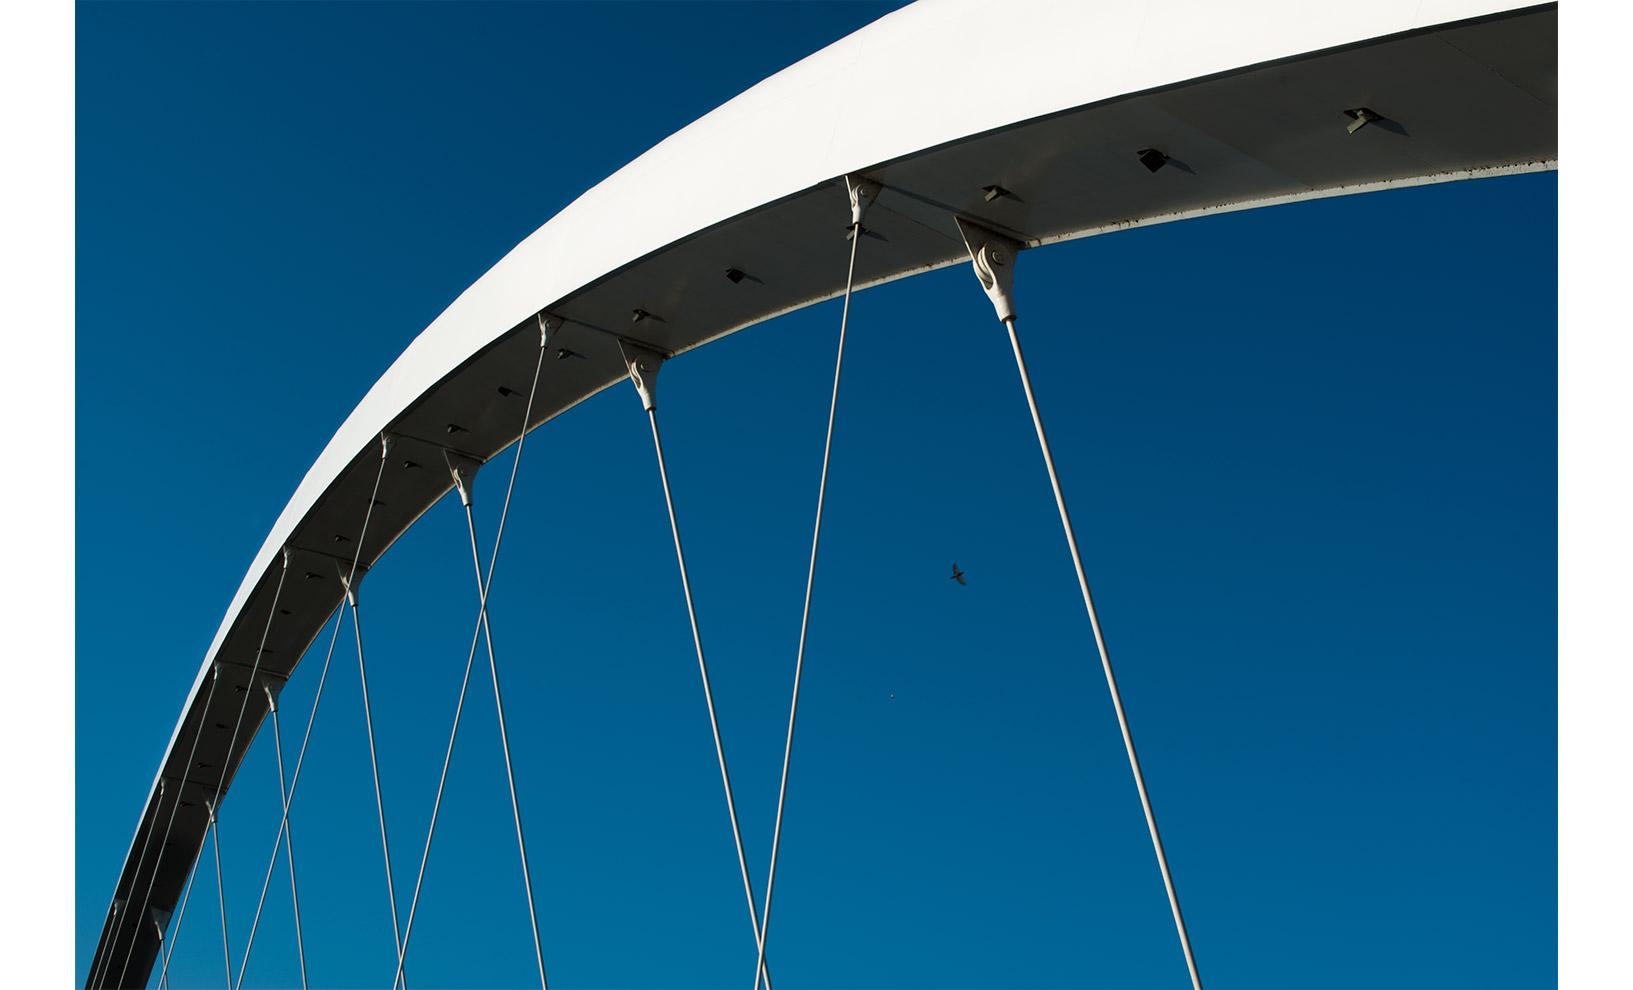 ©marco-tacchini-fotografo-ponte-cittadella-richar-meier-and-partners_17